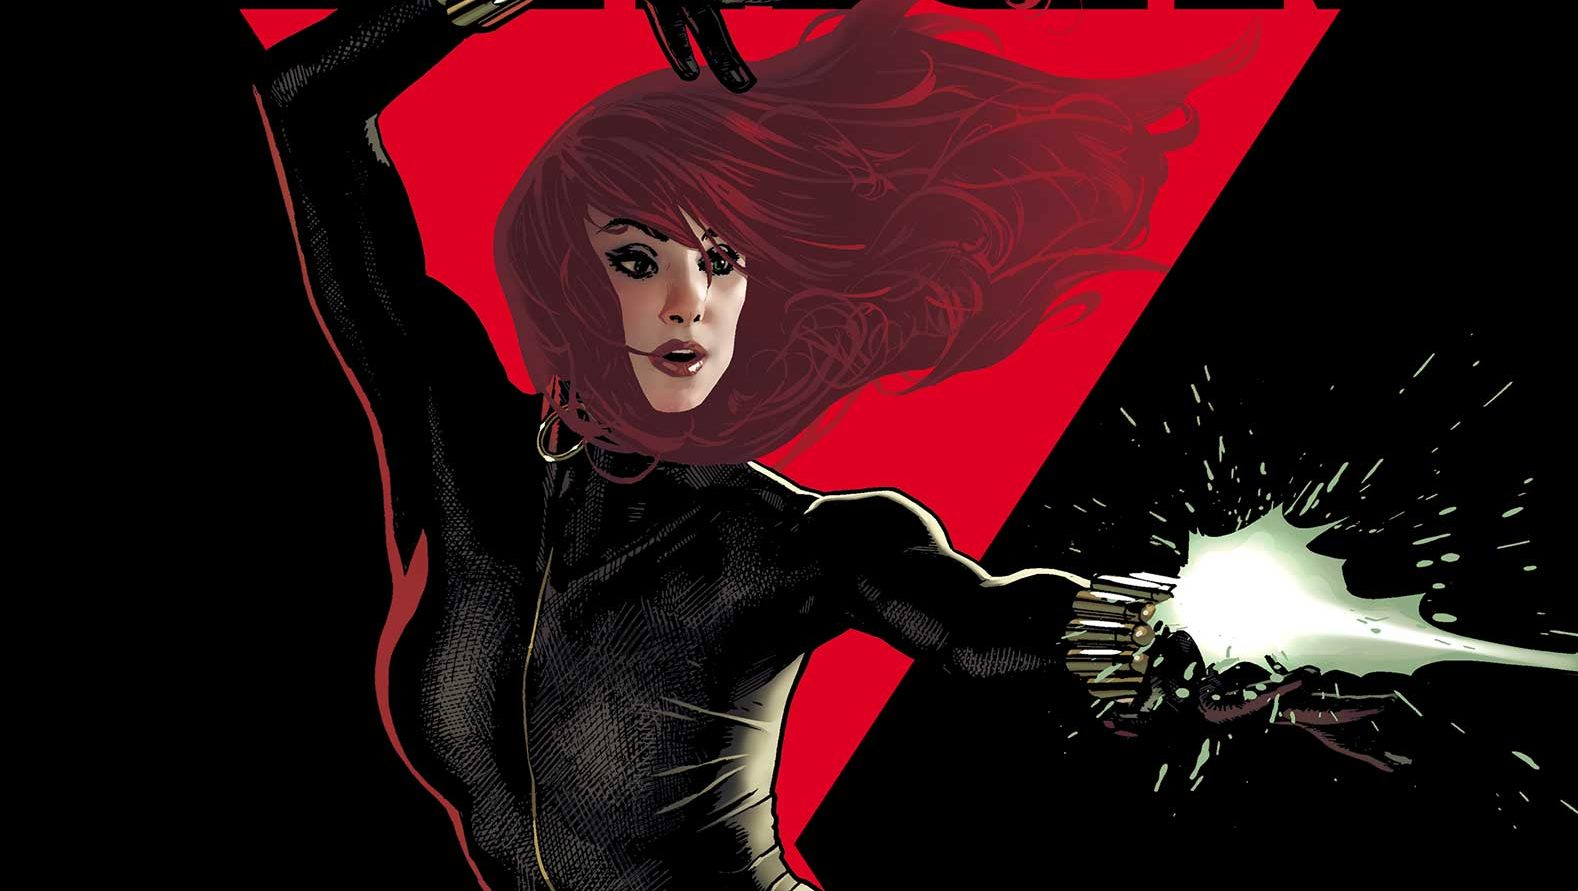 Resultado de imagem para Black widow kelly thompson